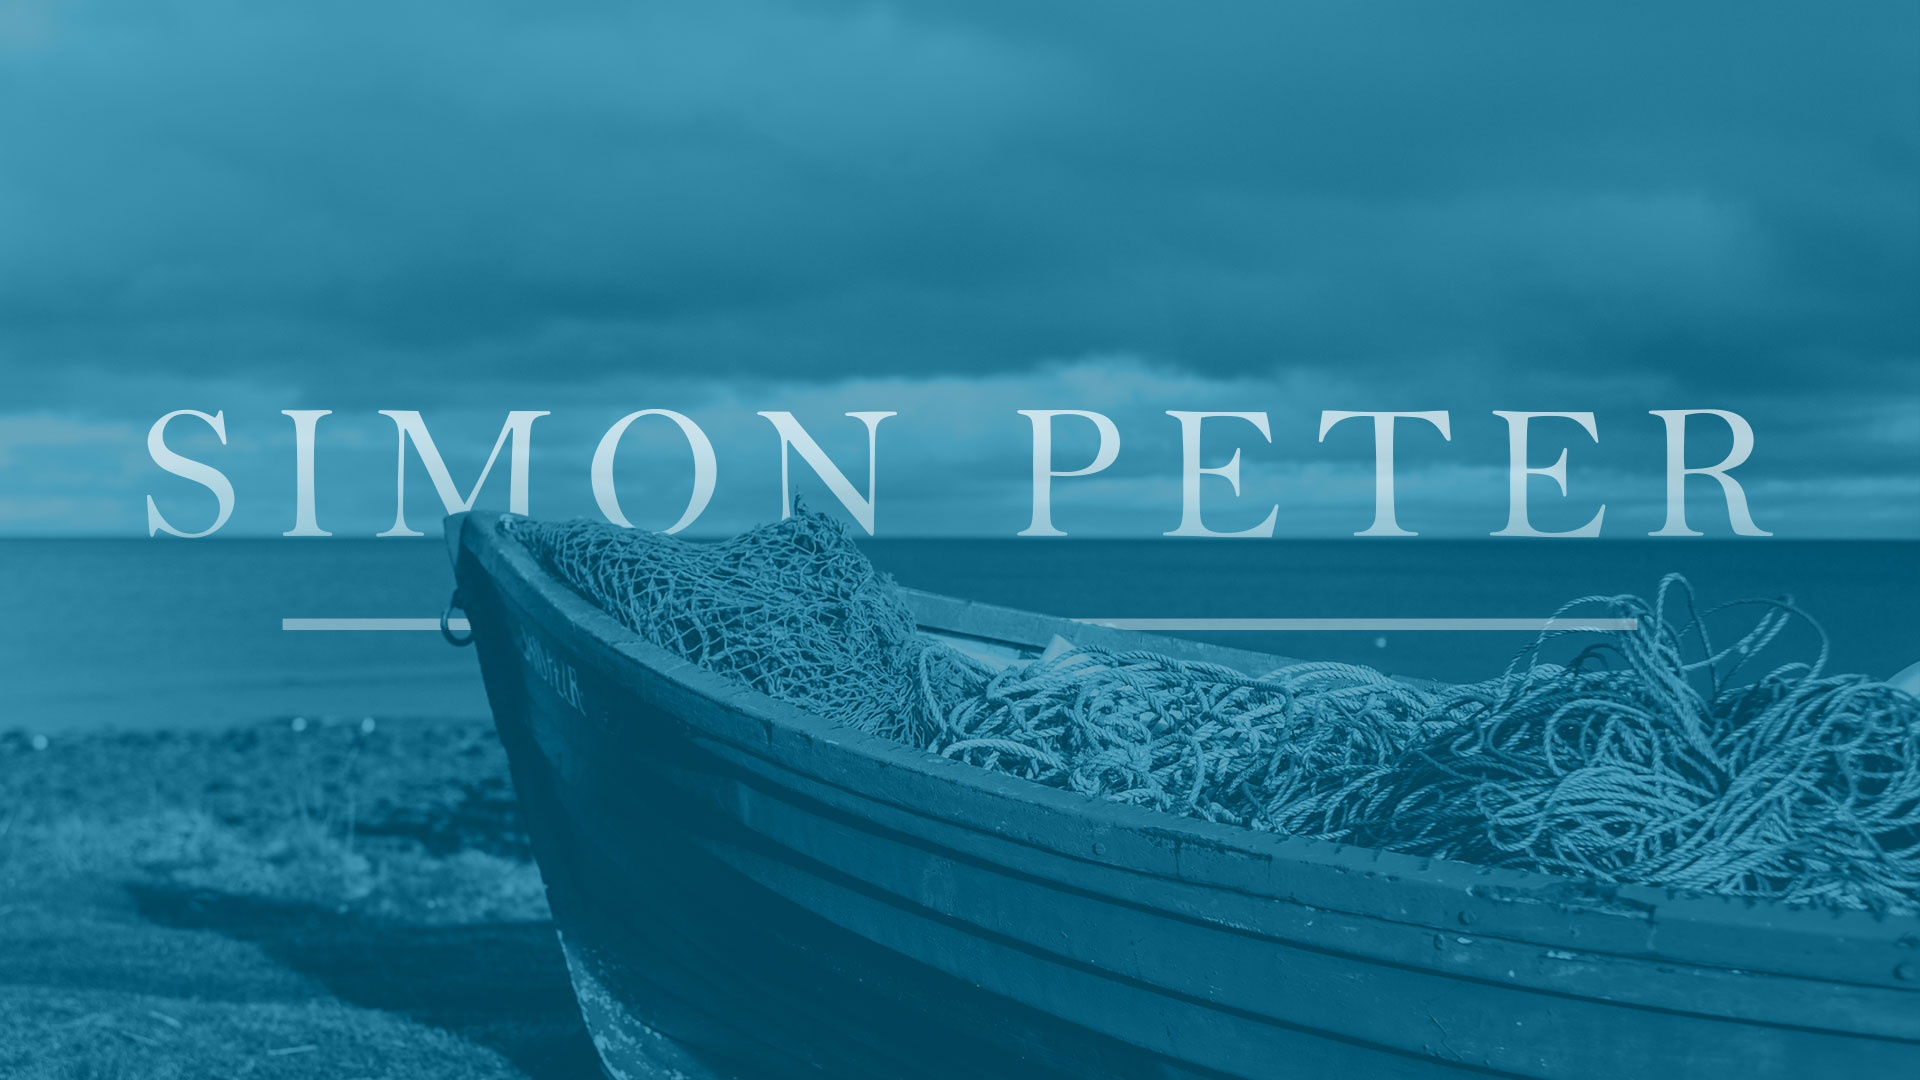 Why do they call him Peter Precious?